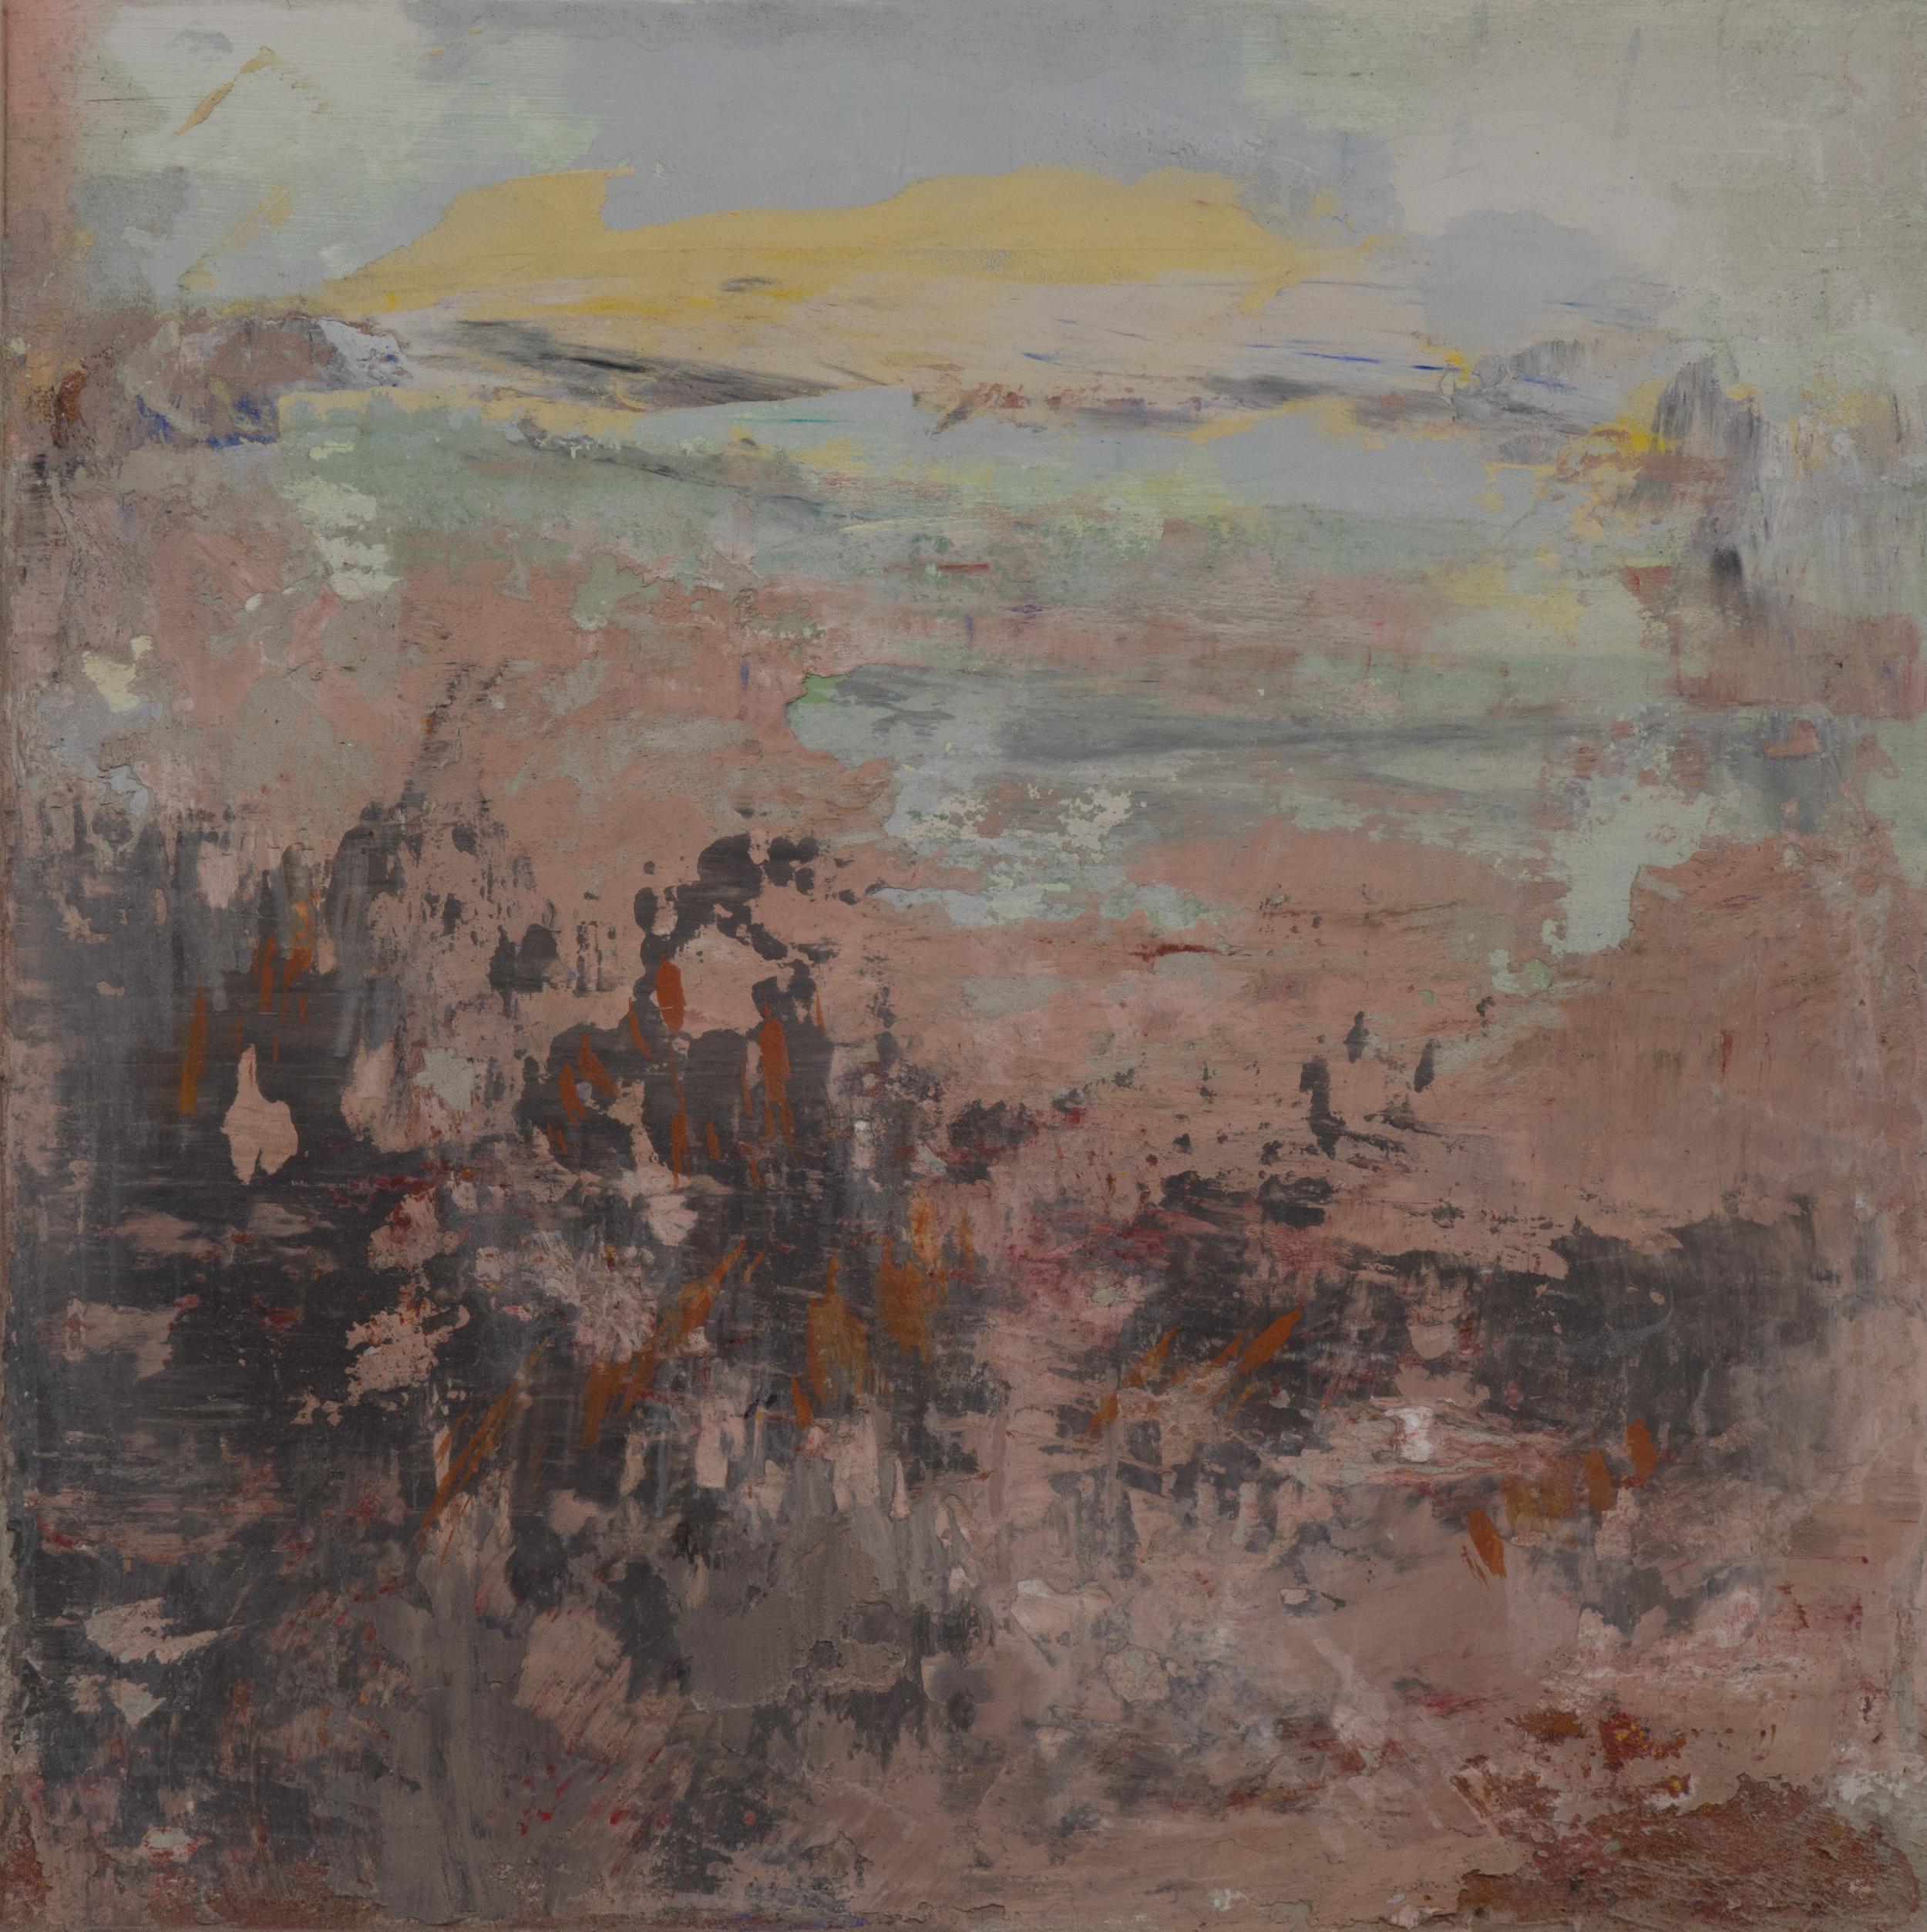 SV-062, Shelley Vanderbyl, Fireweed, 2016, Fresco on Panel, 16x16